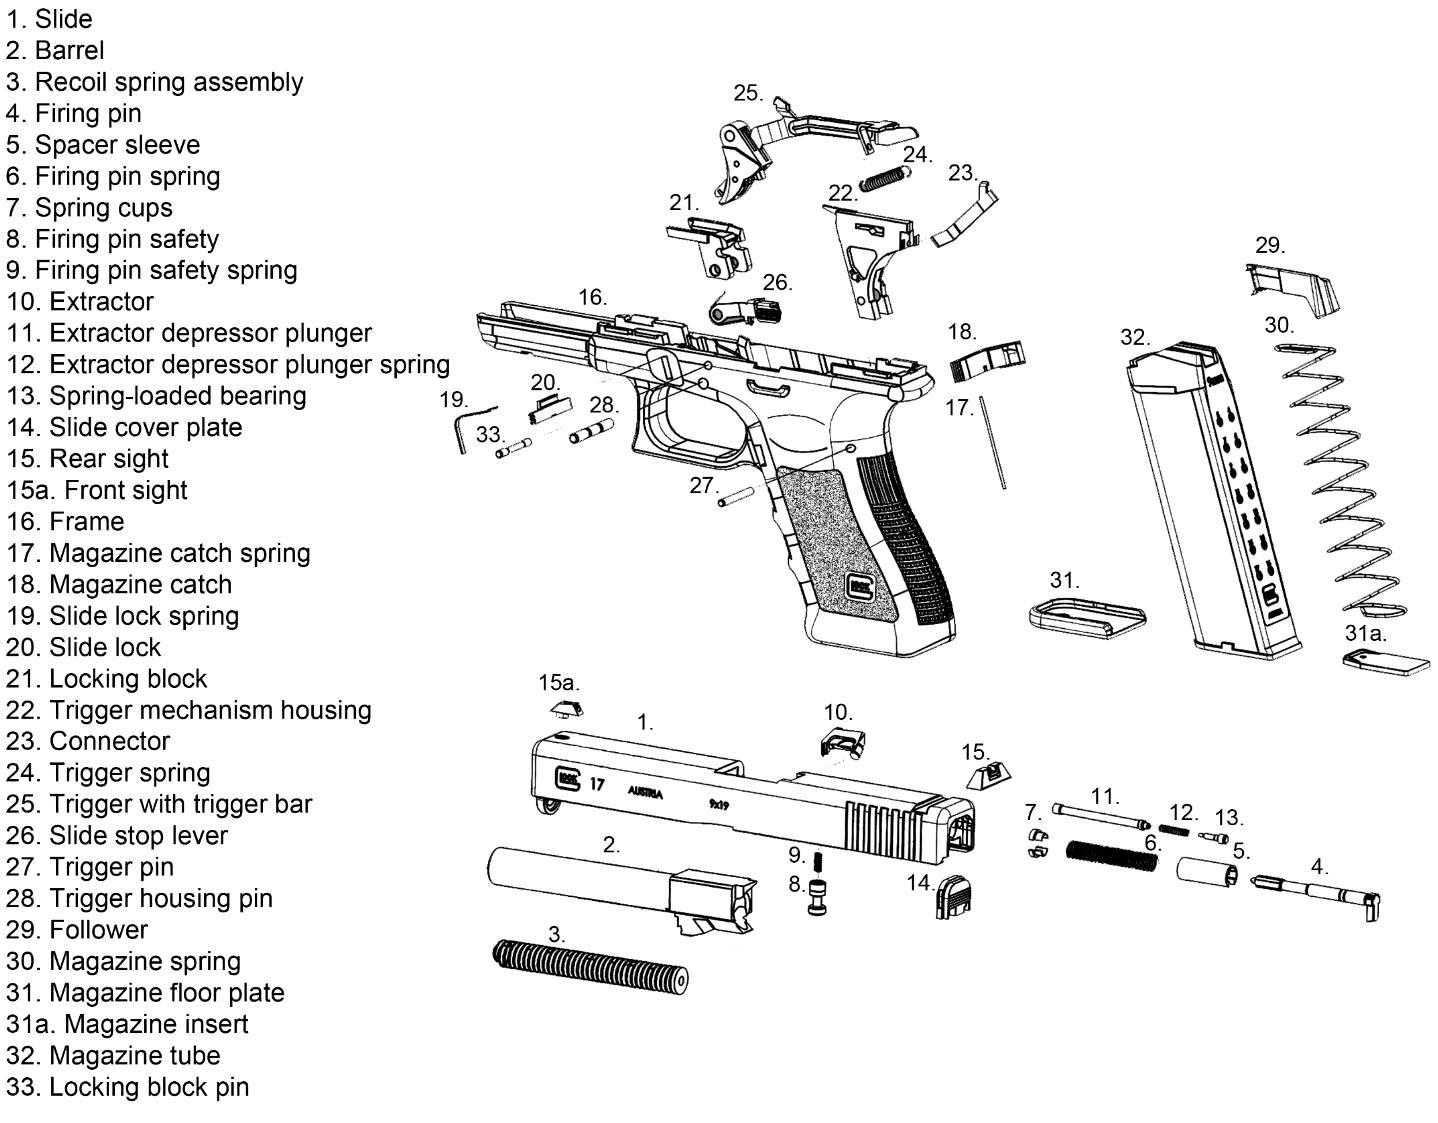 small resolution of glock 17 exploded diagram firearms glock 22 guns firearms glock 17 frame parts diagram glock 17 nomenclature diagram